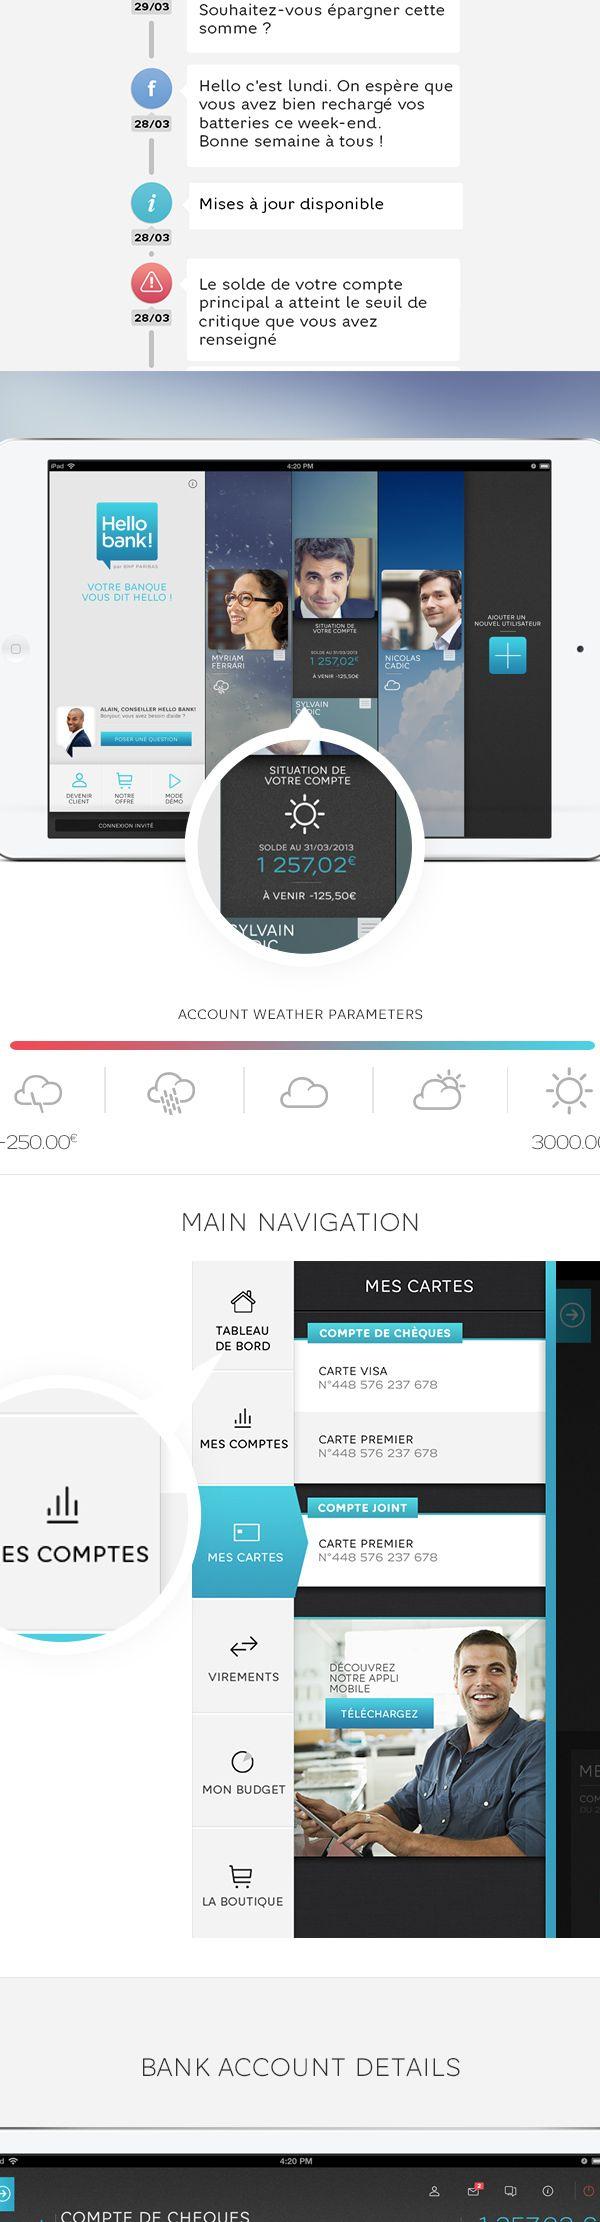 Pin On Interactive Design